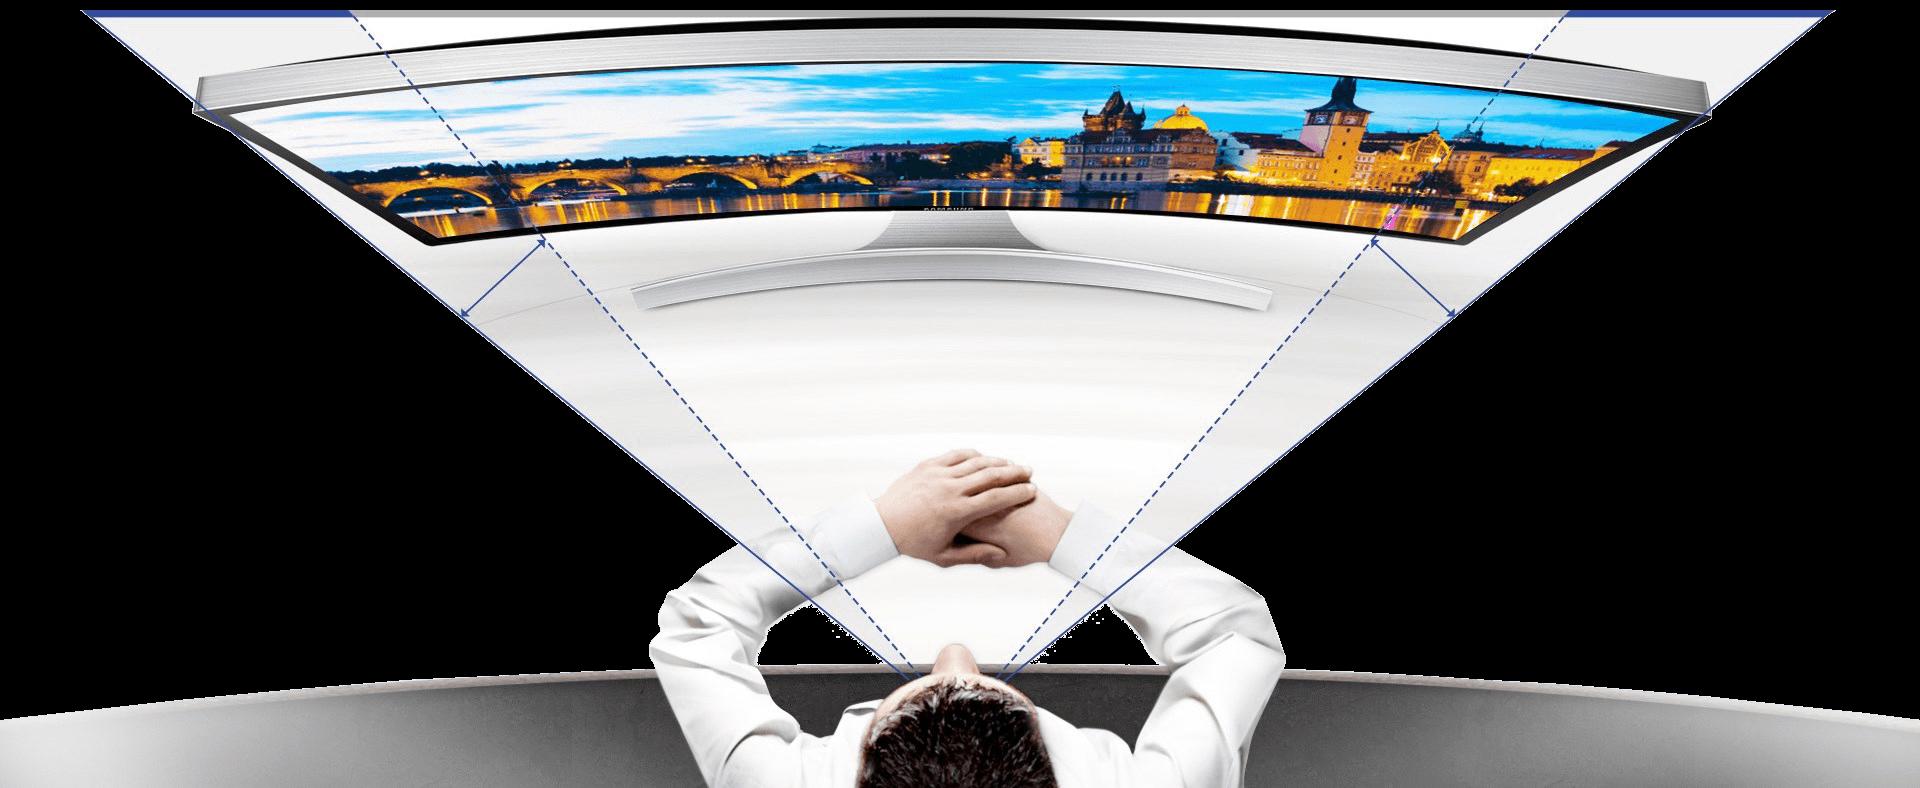 Prohnutý monitor